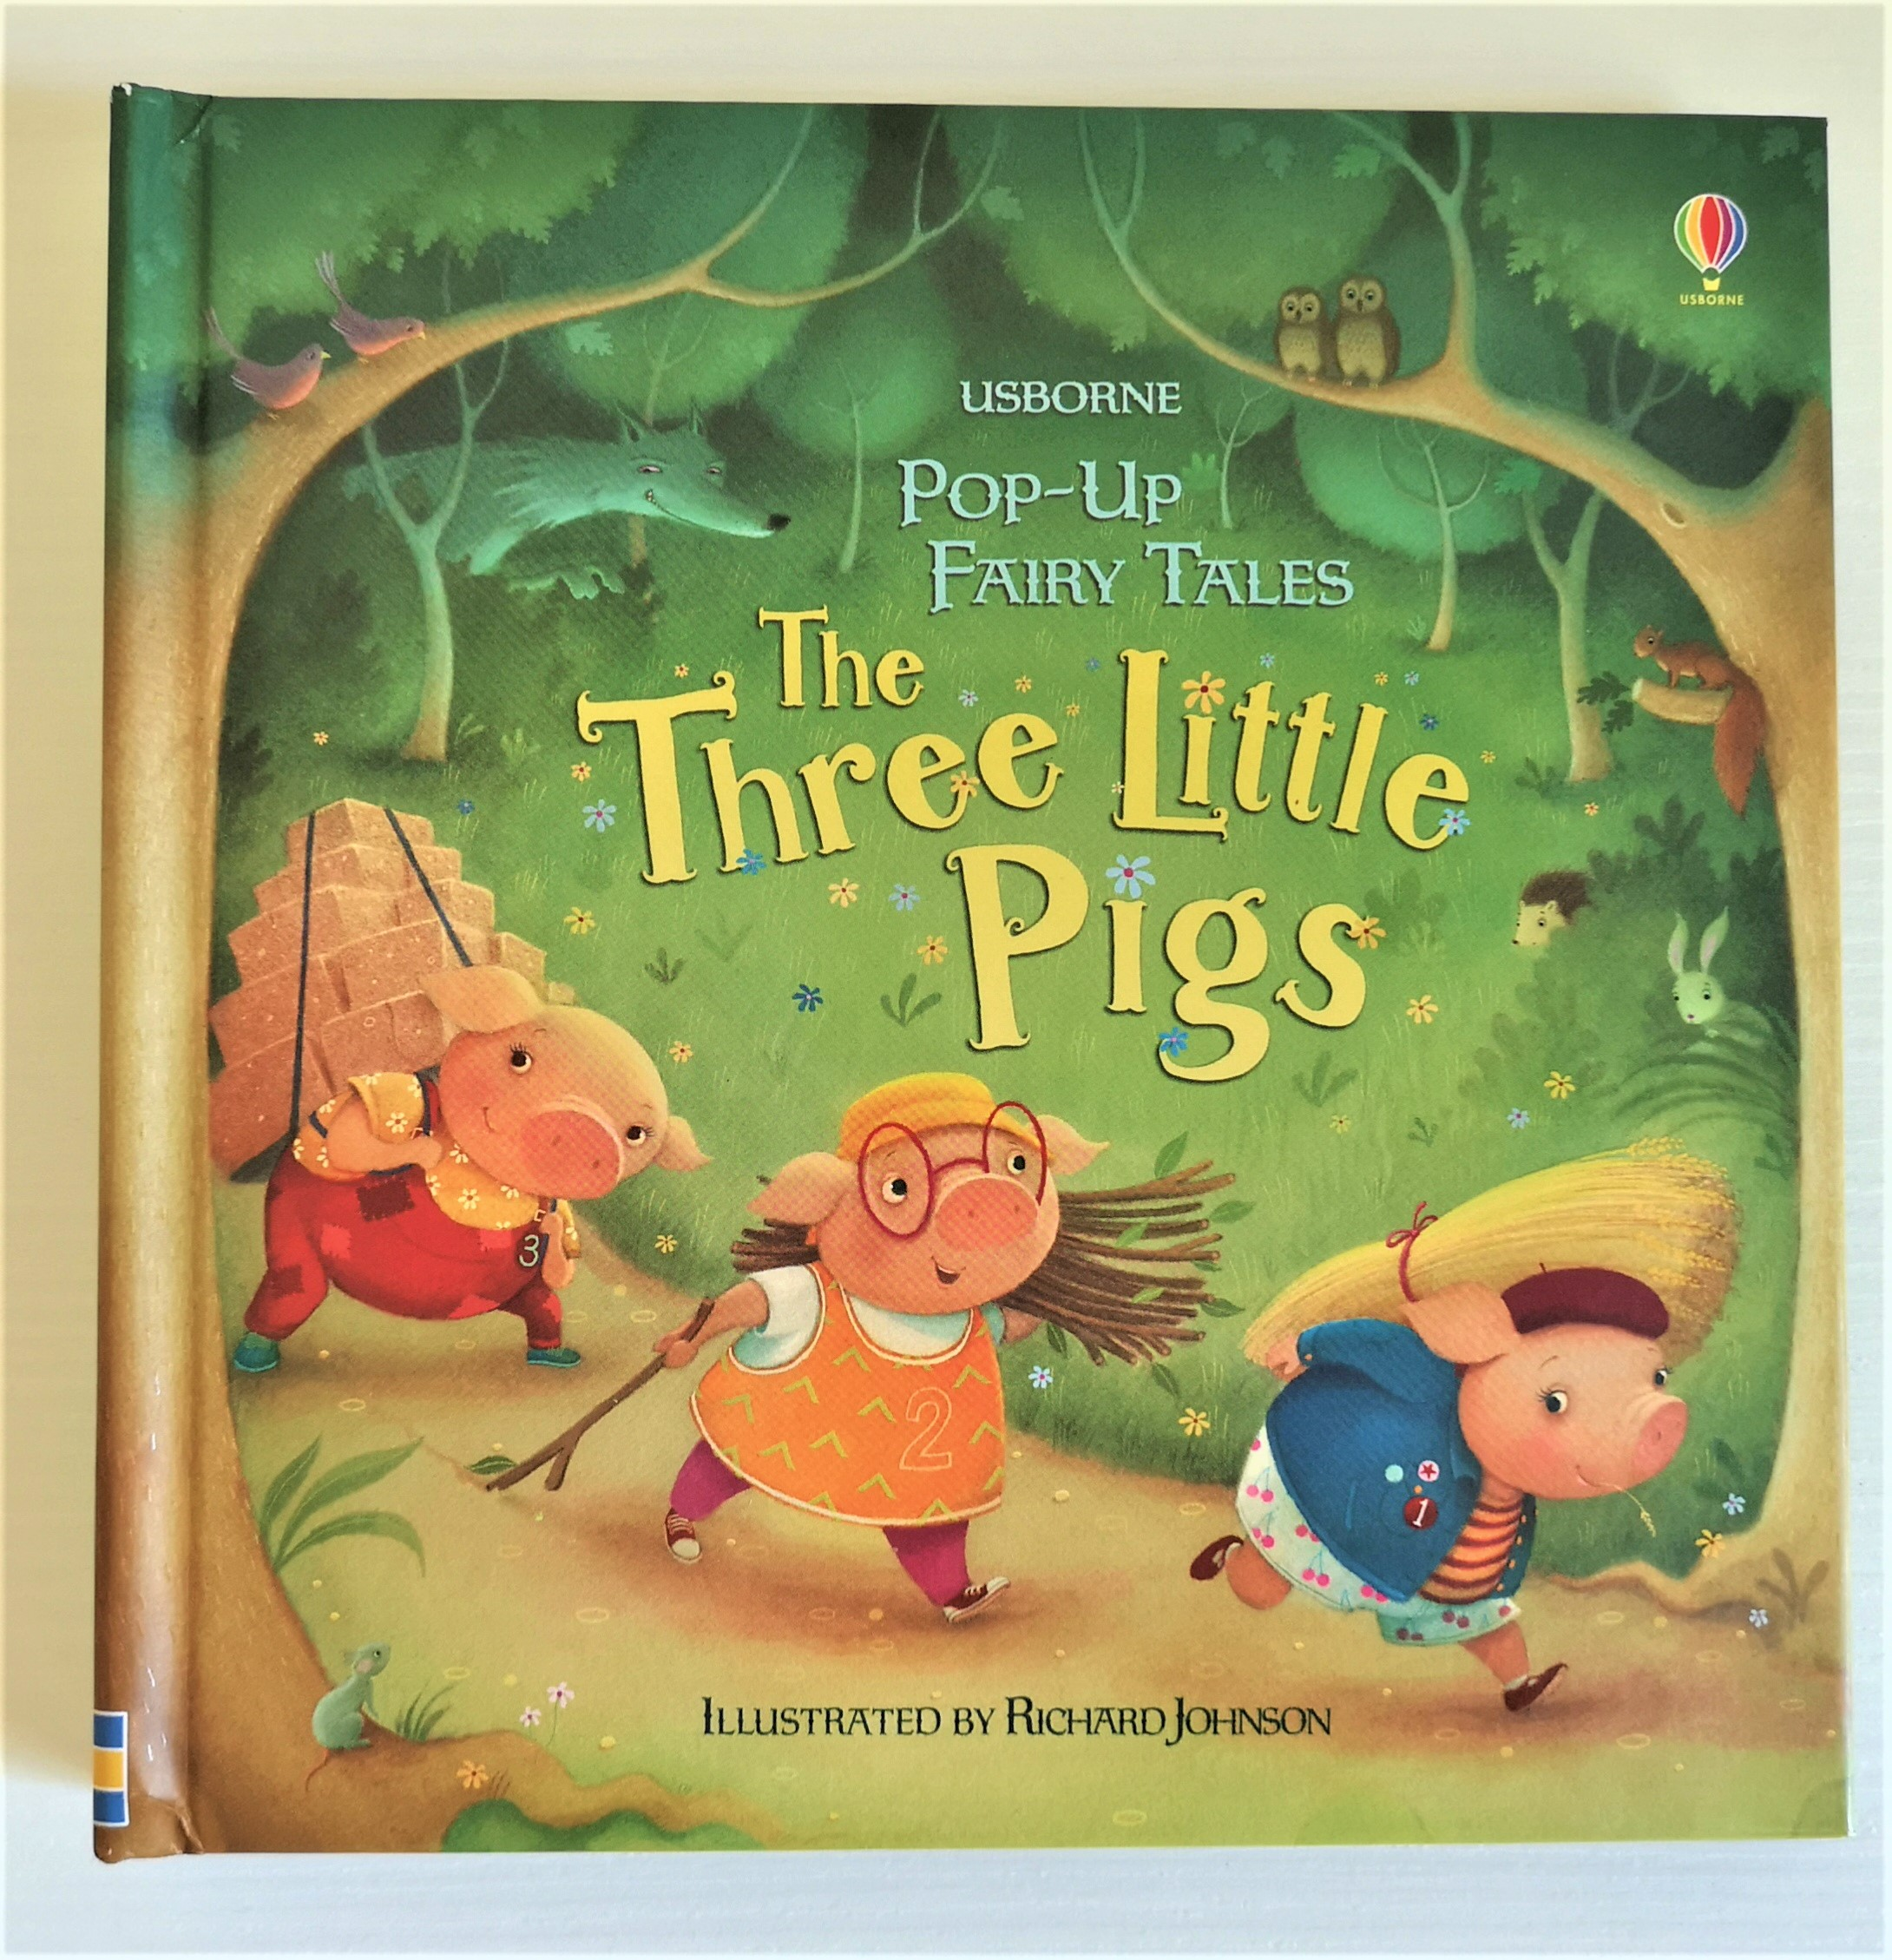 THE THREE LITTLE PIGS raccontato da Susanna Davidson, USBORNE